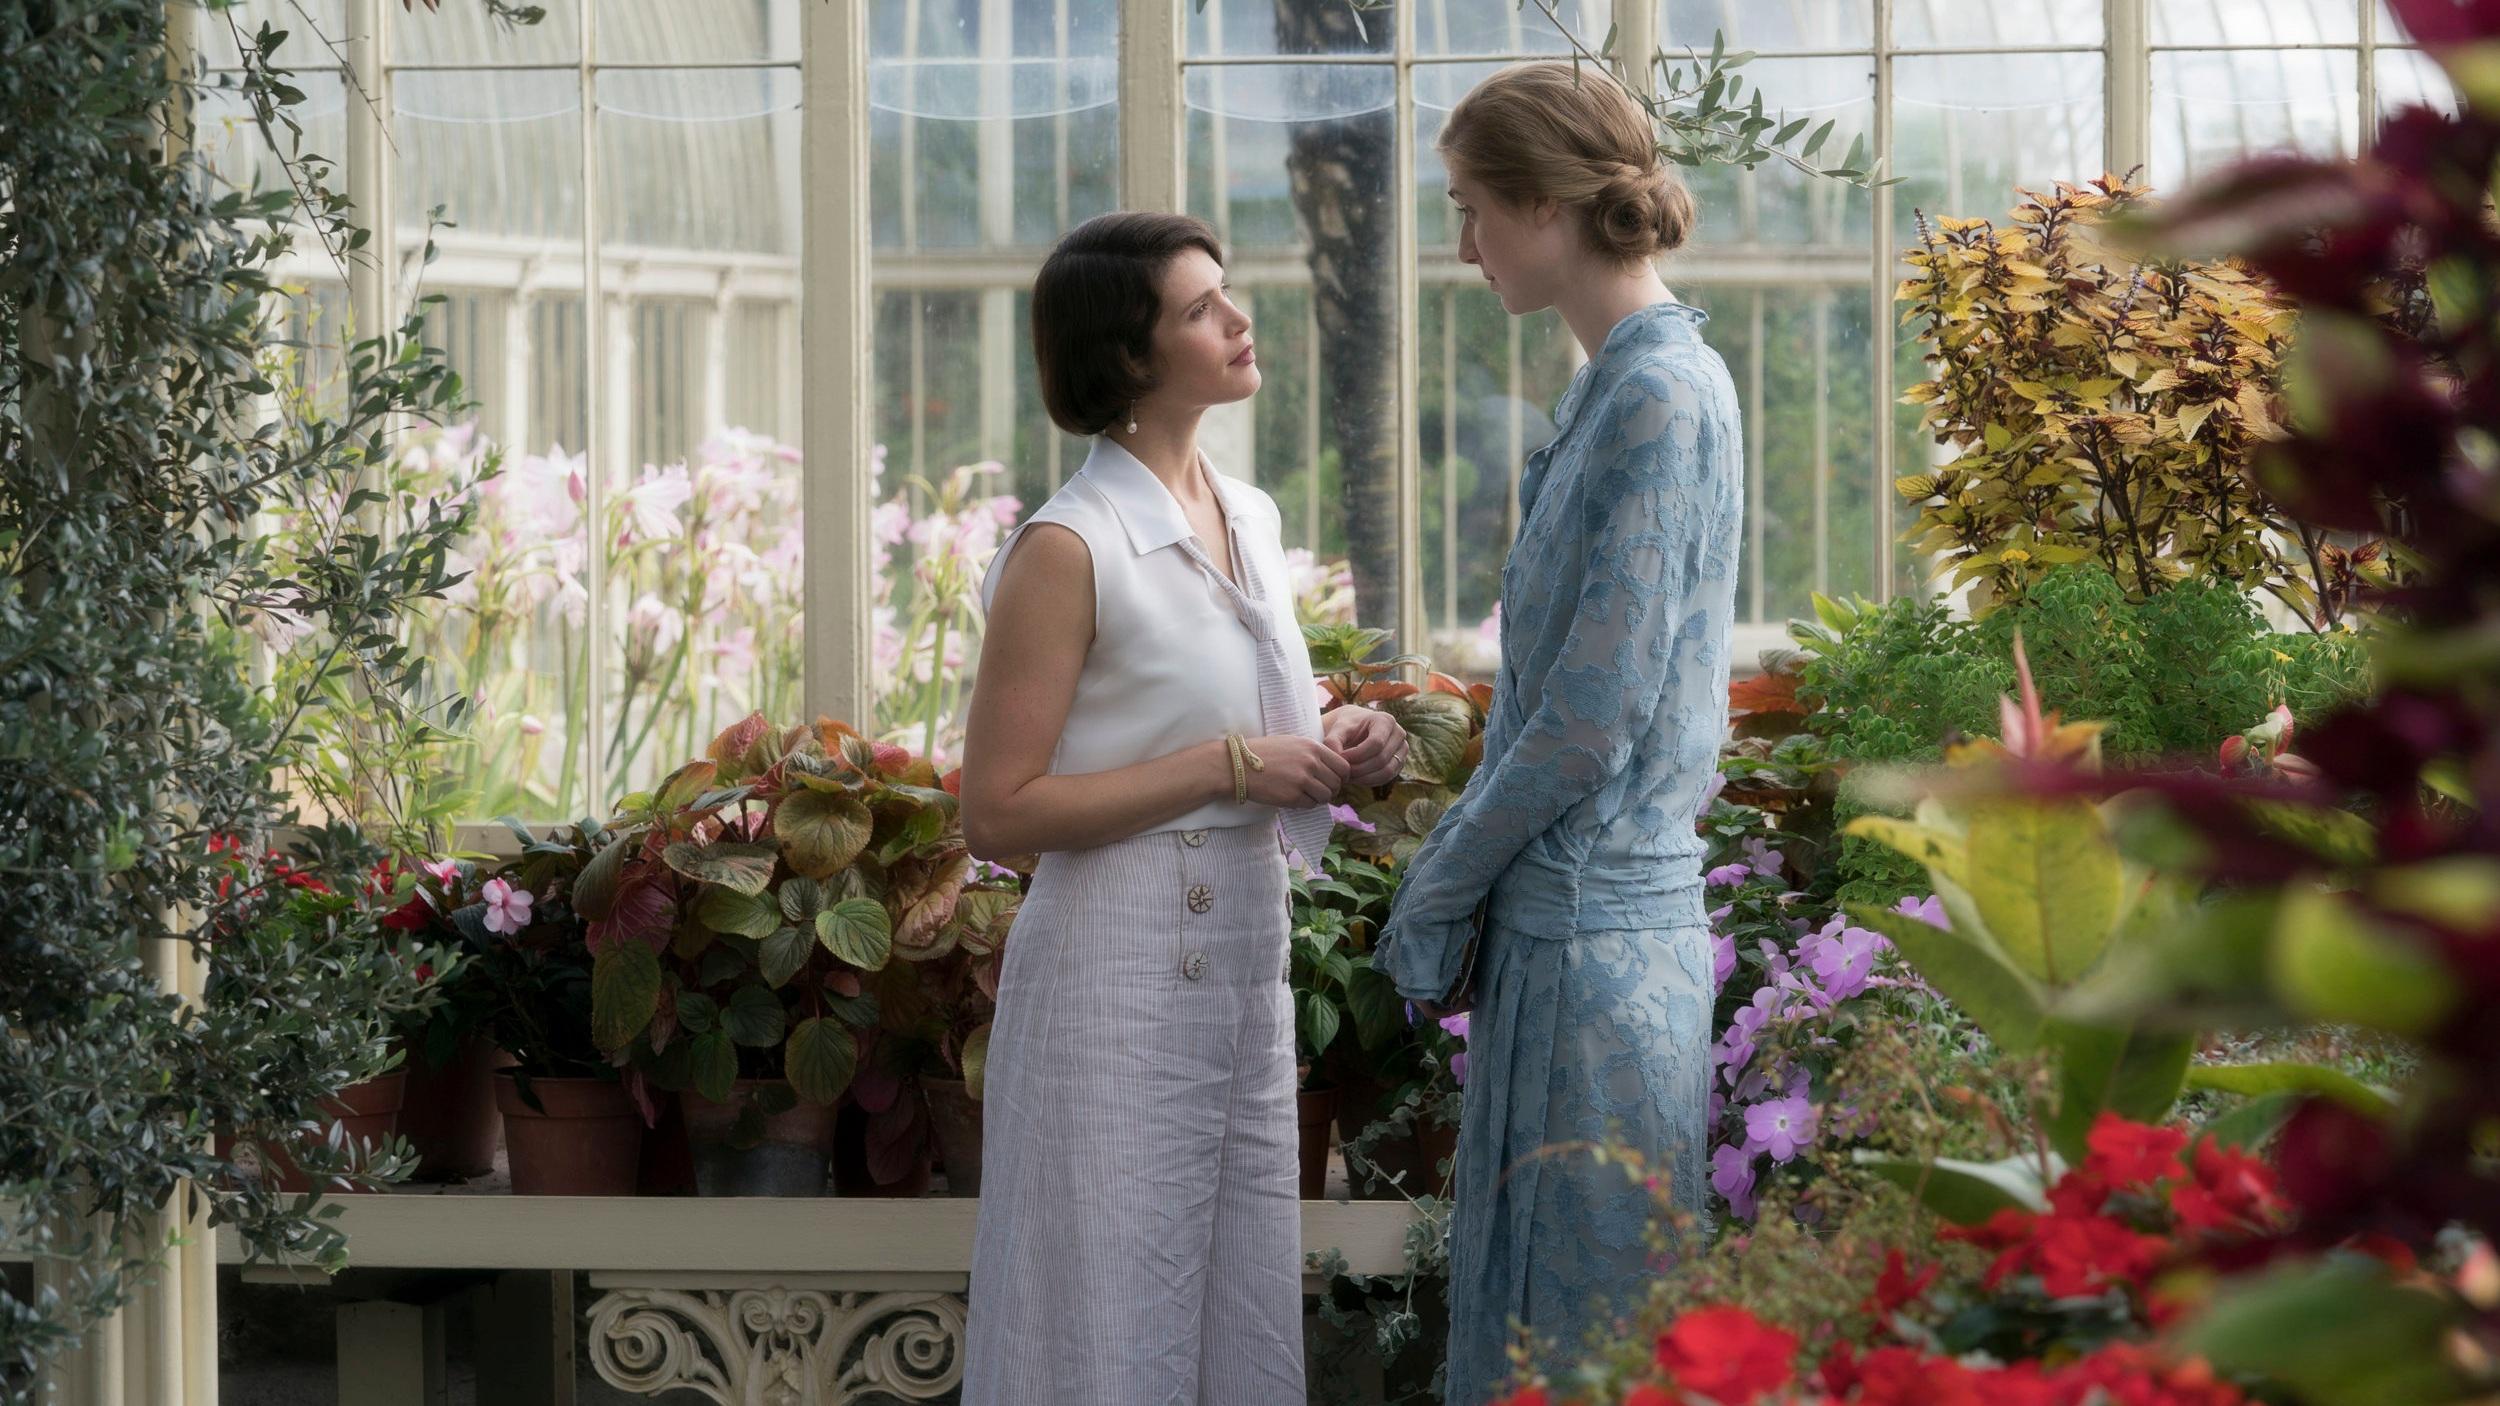 Gemma Arterton and Elizabeth Debicki in  Vita & Virginia